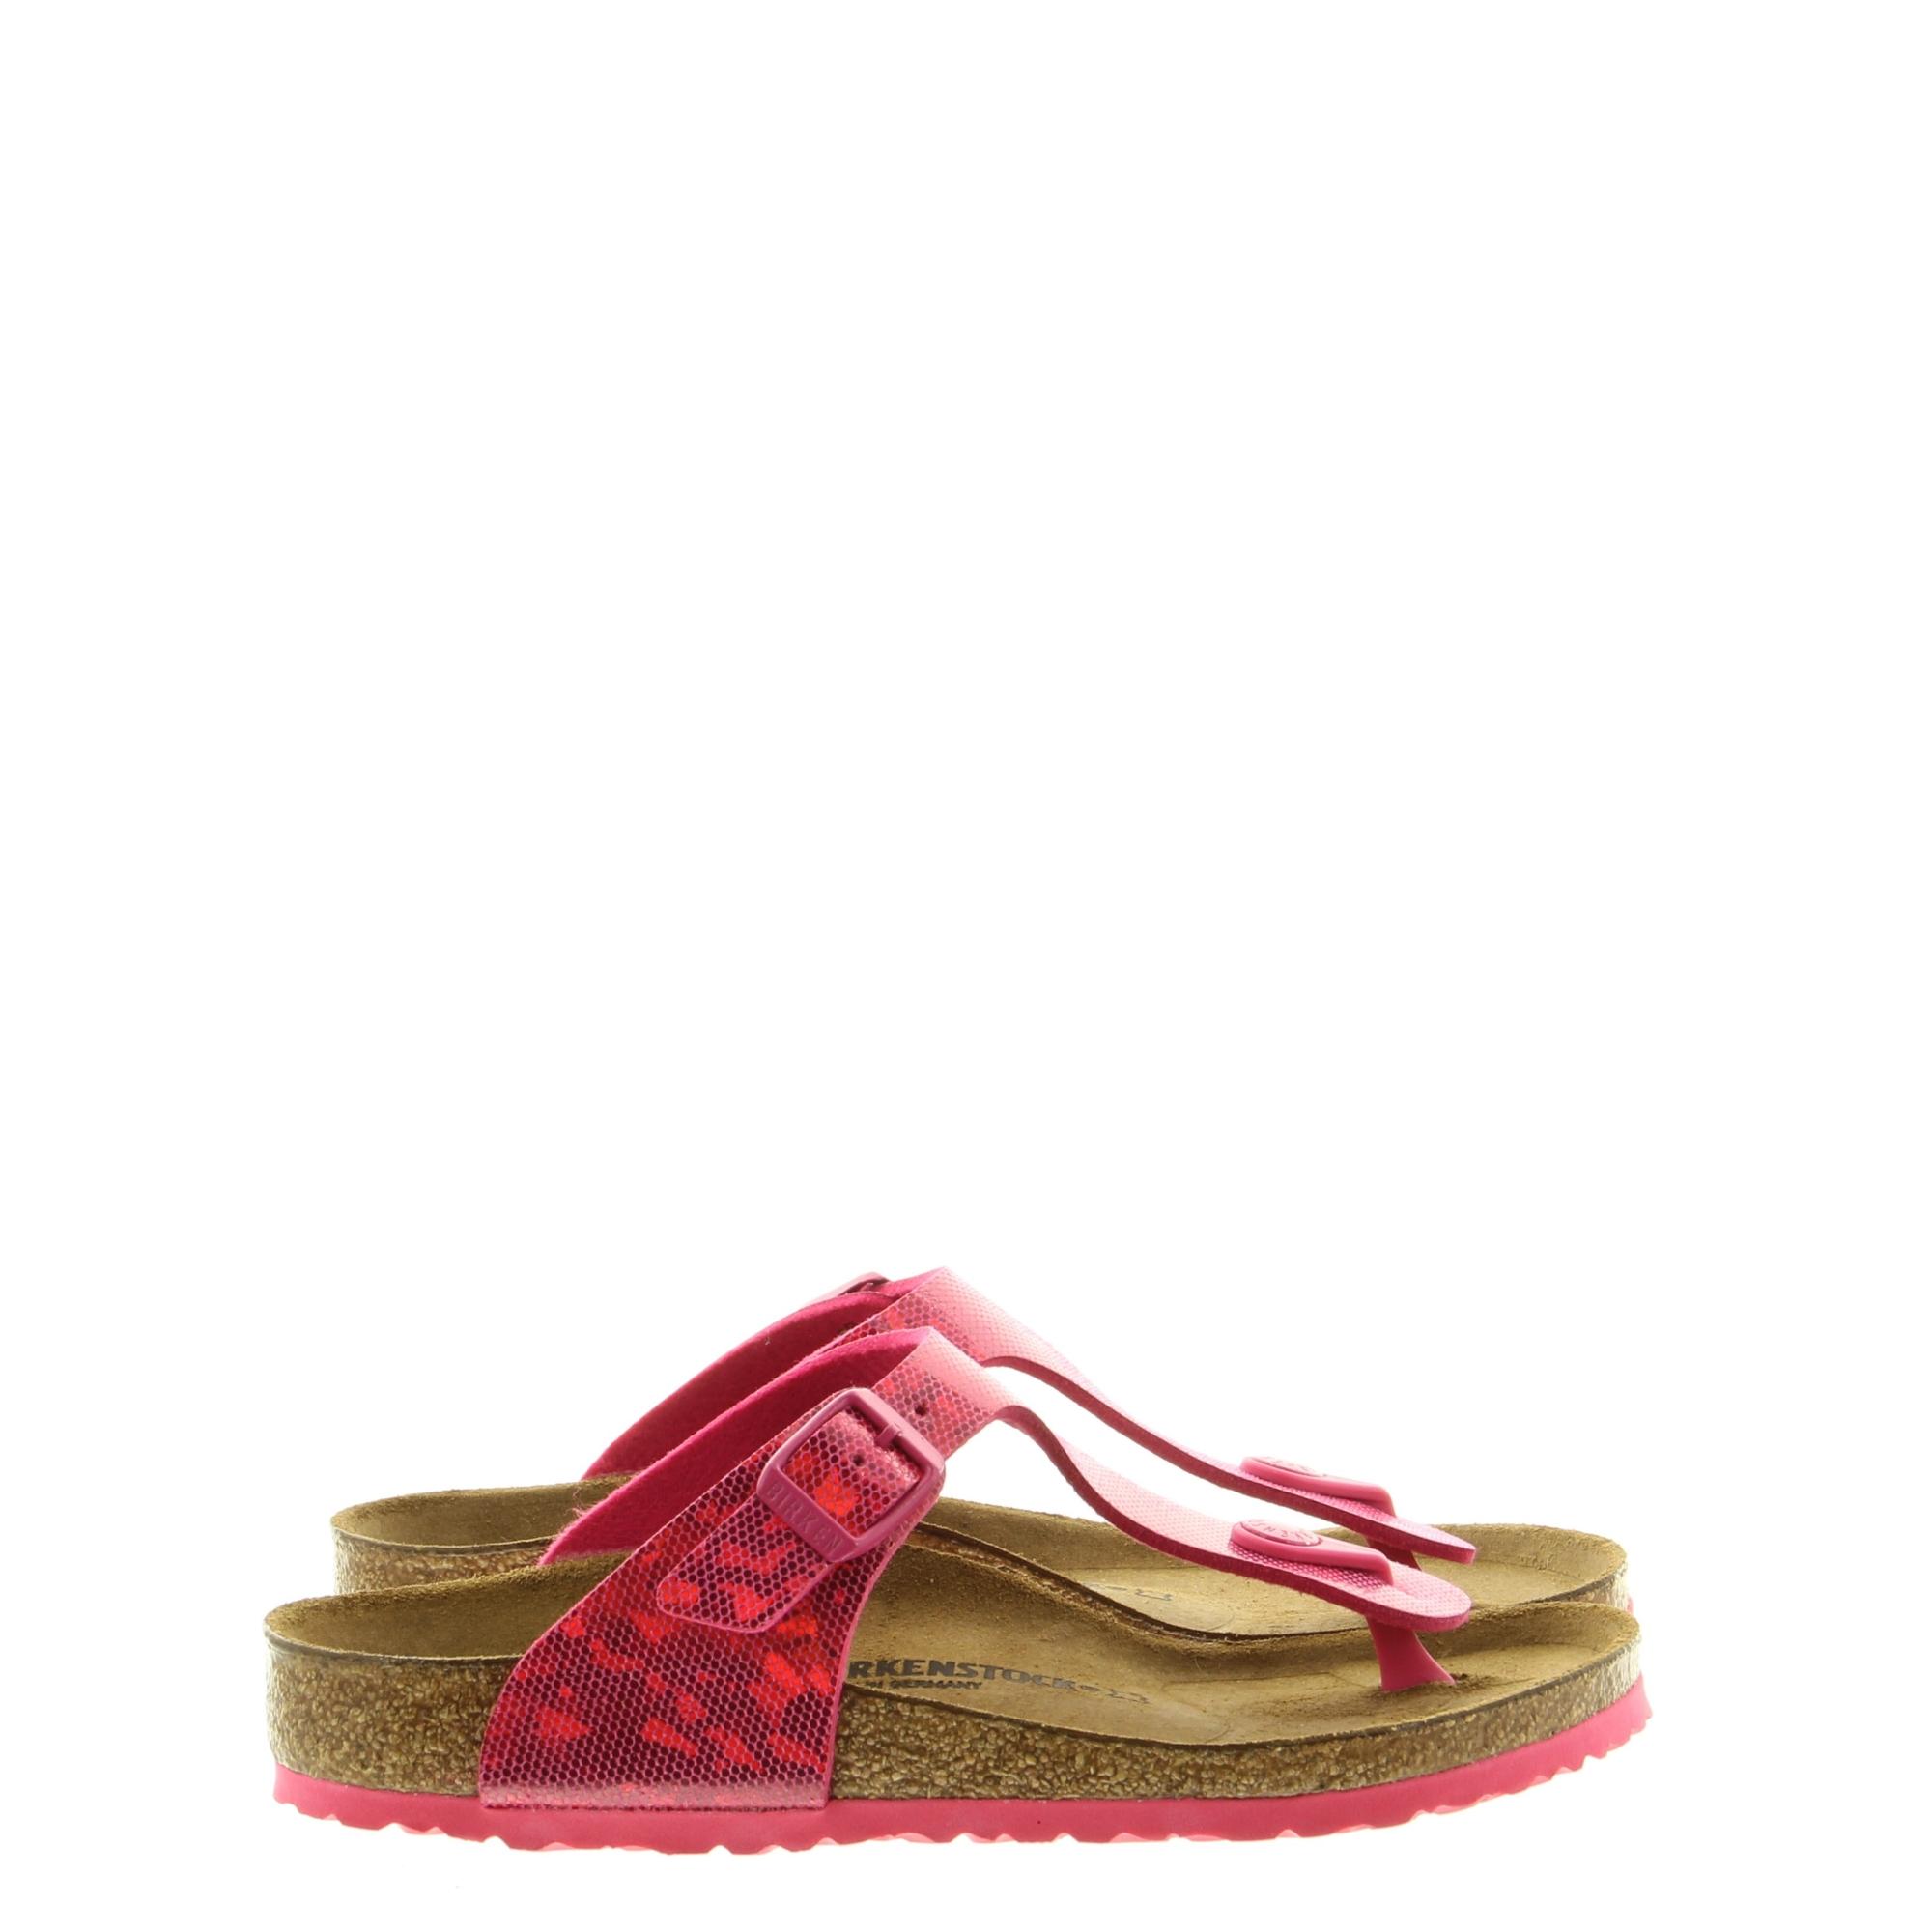 Birkenstock 1013180 Gizeh Hologram Pink Narrow